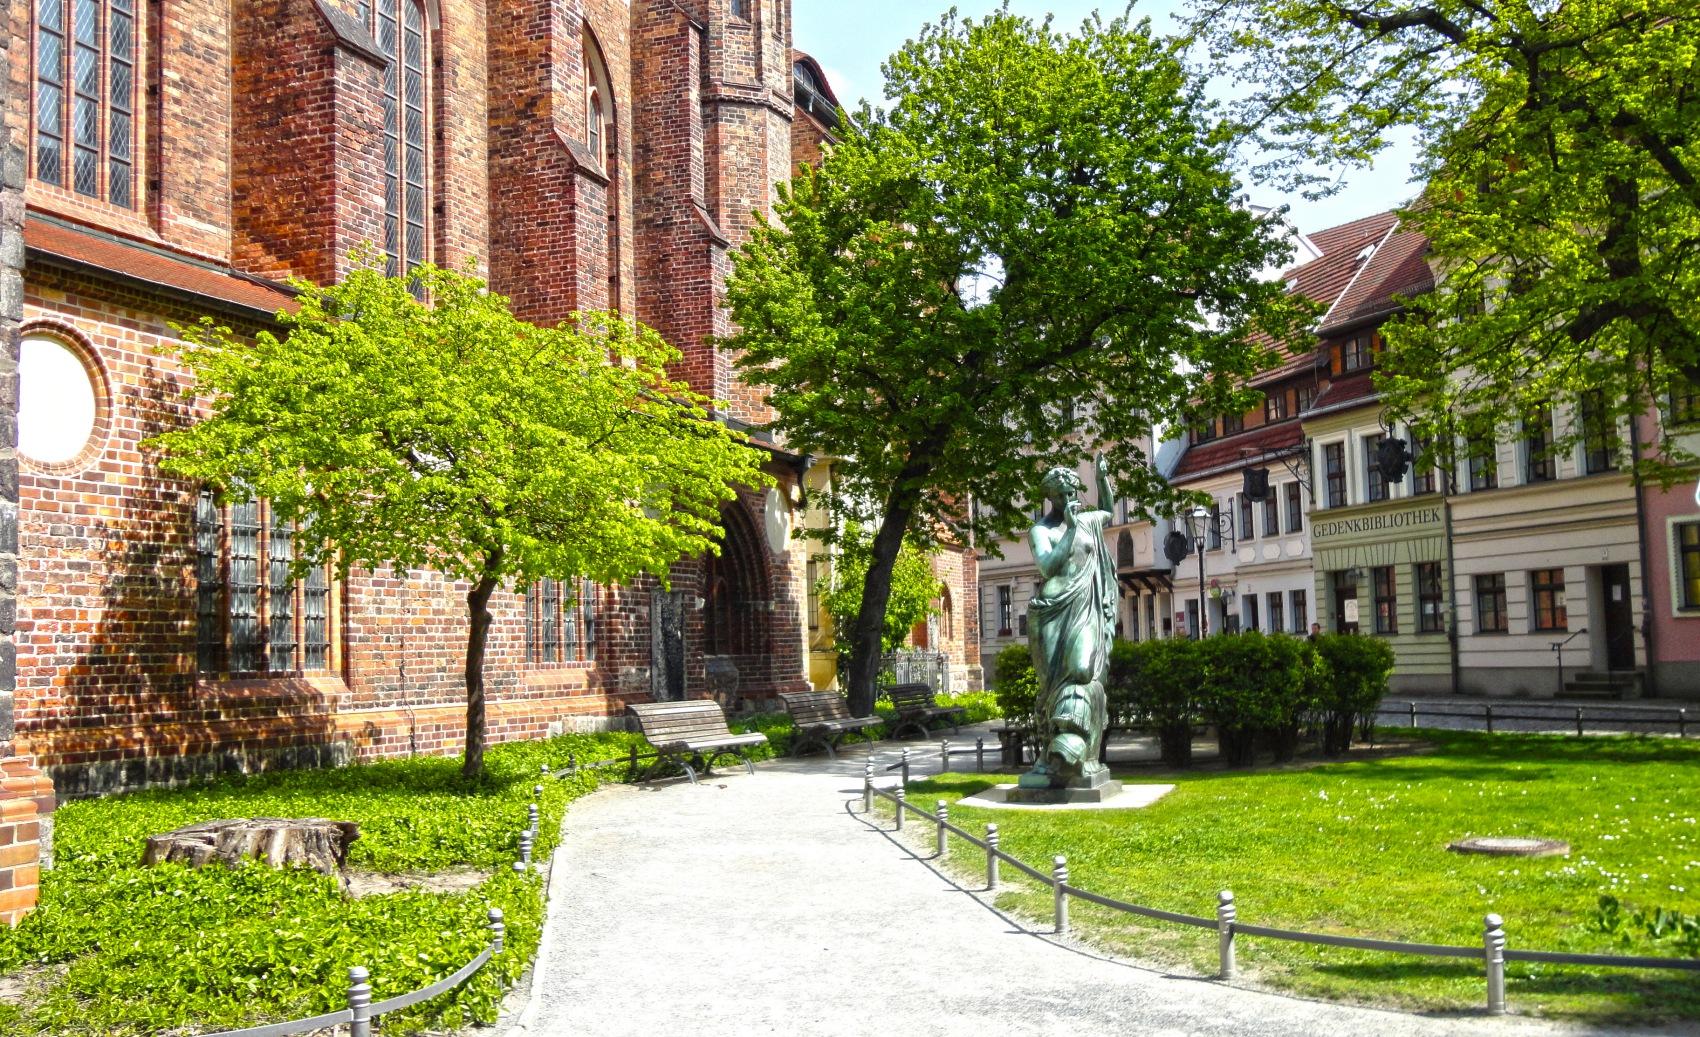 Nikolaiviertel Berlin